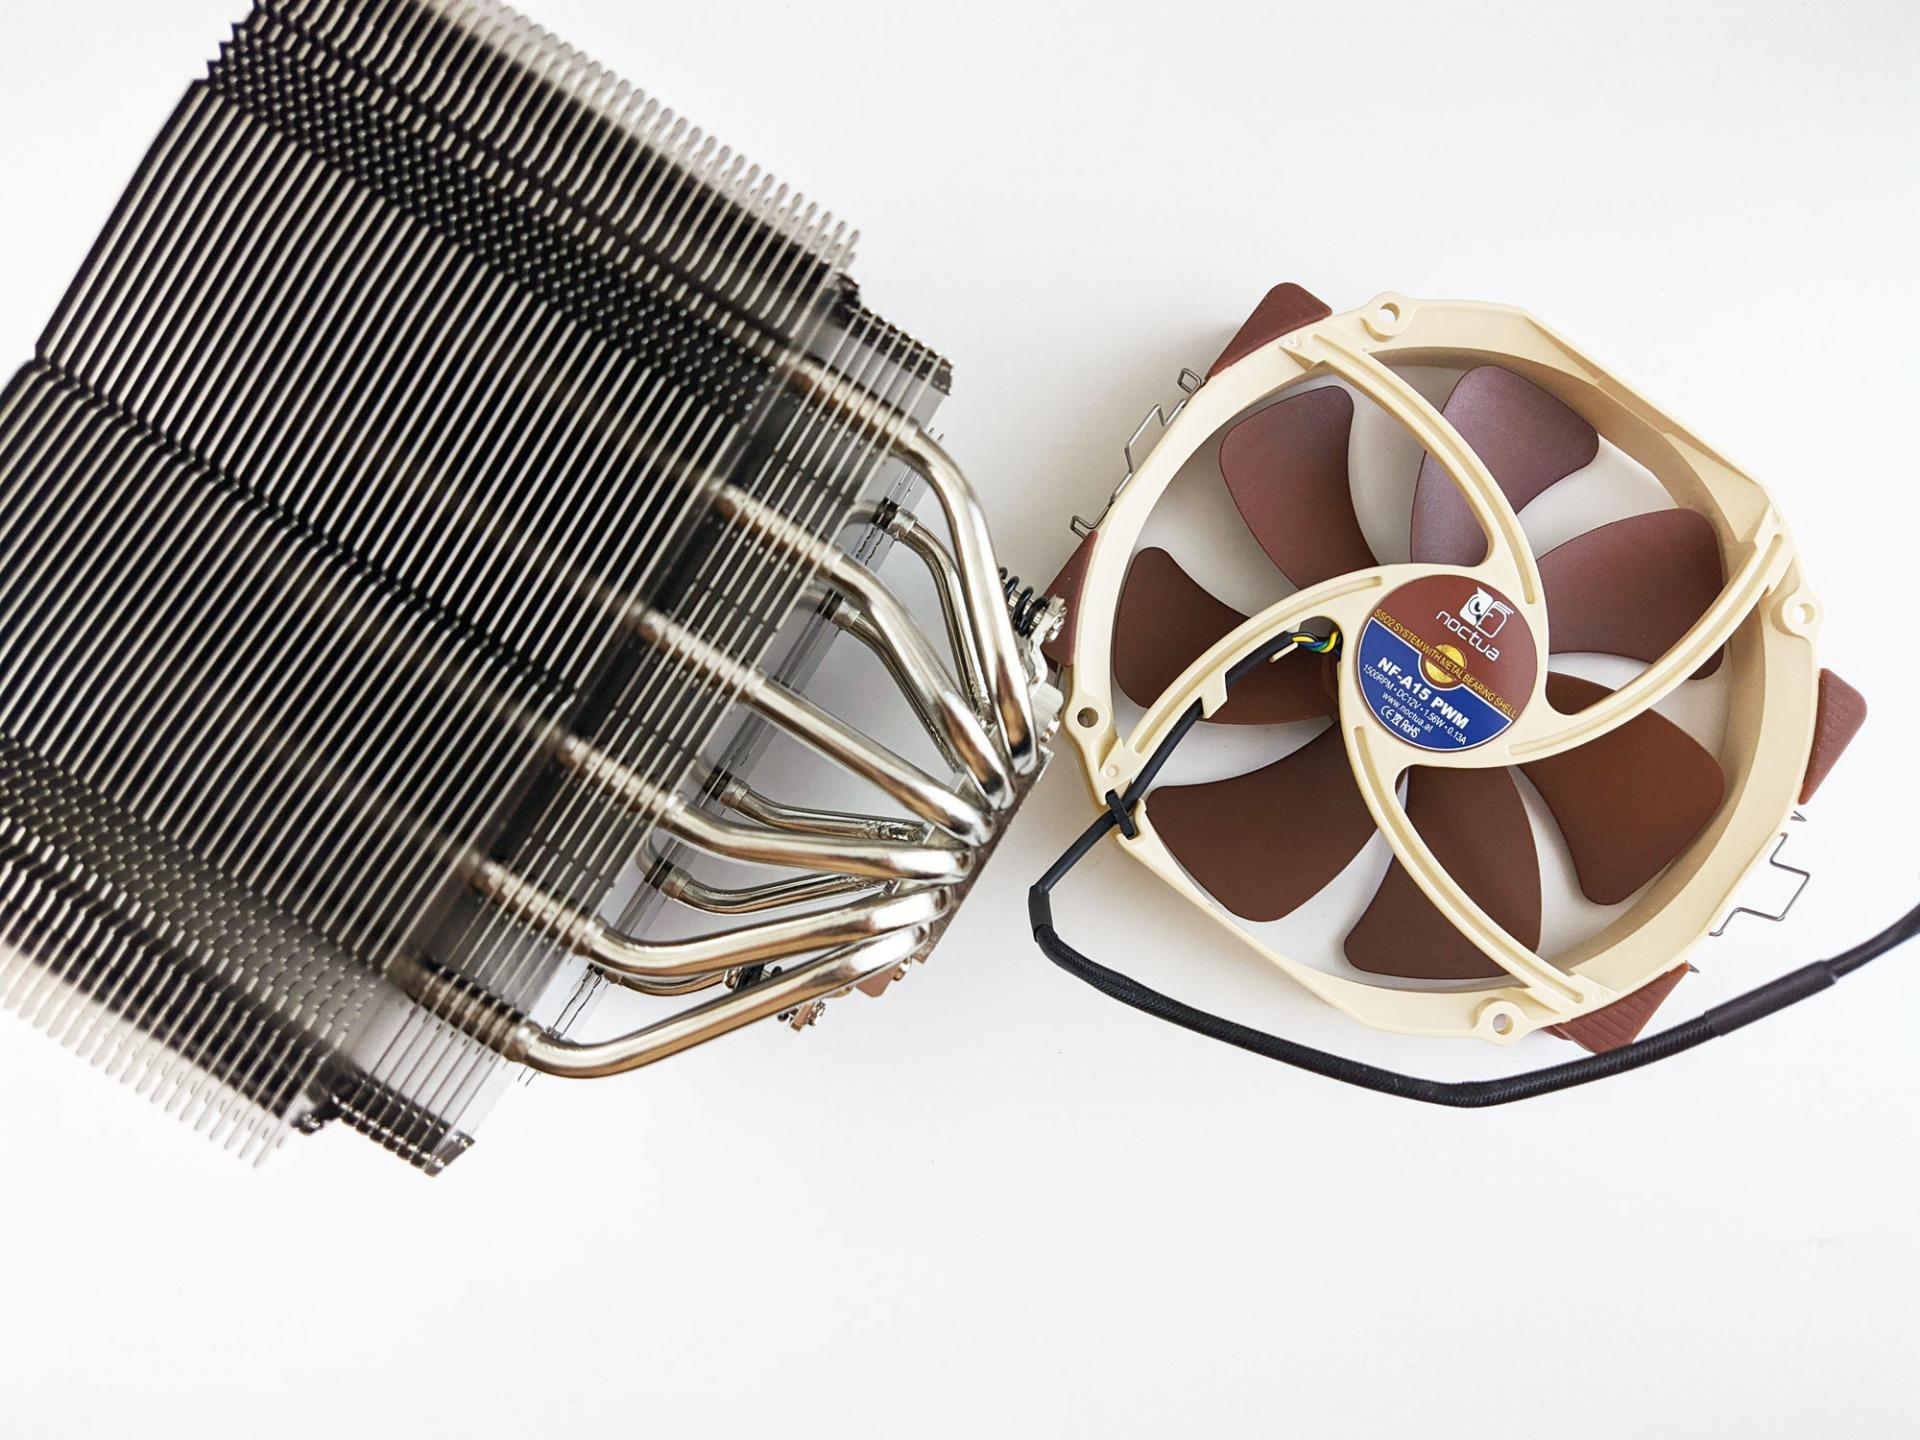 Охлаждаем процессор Intel Core i9-10900 кулером Noctua NH-D15S